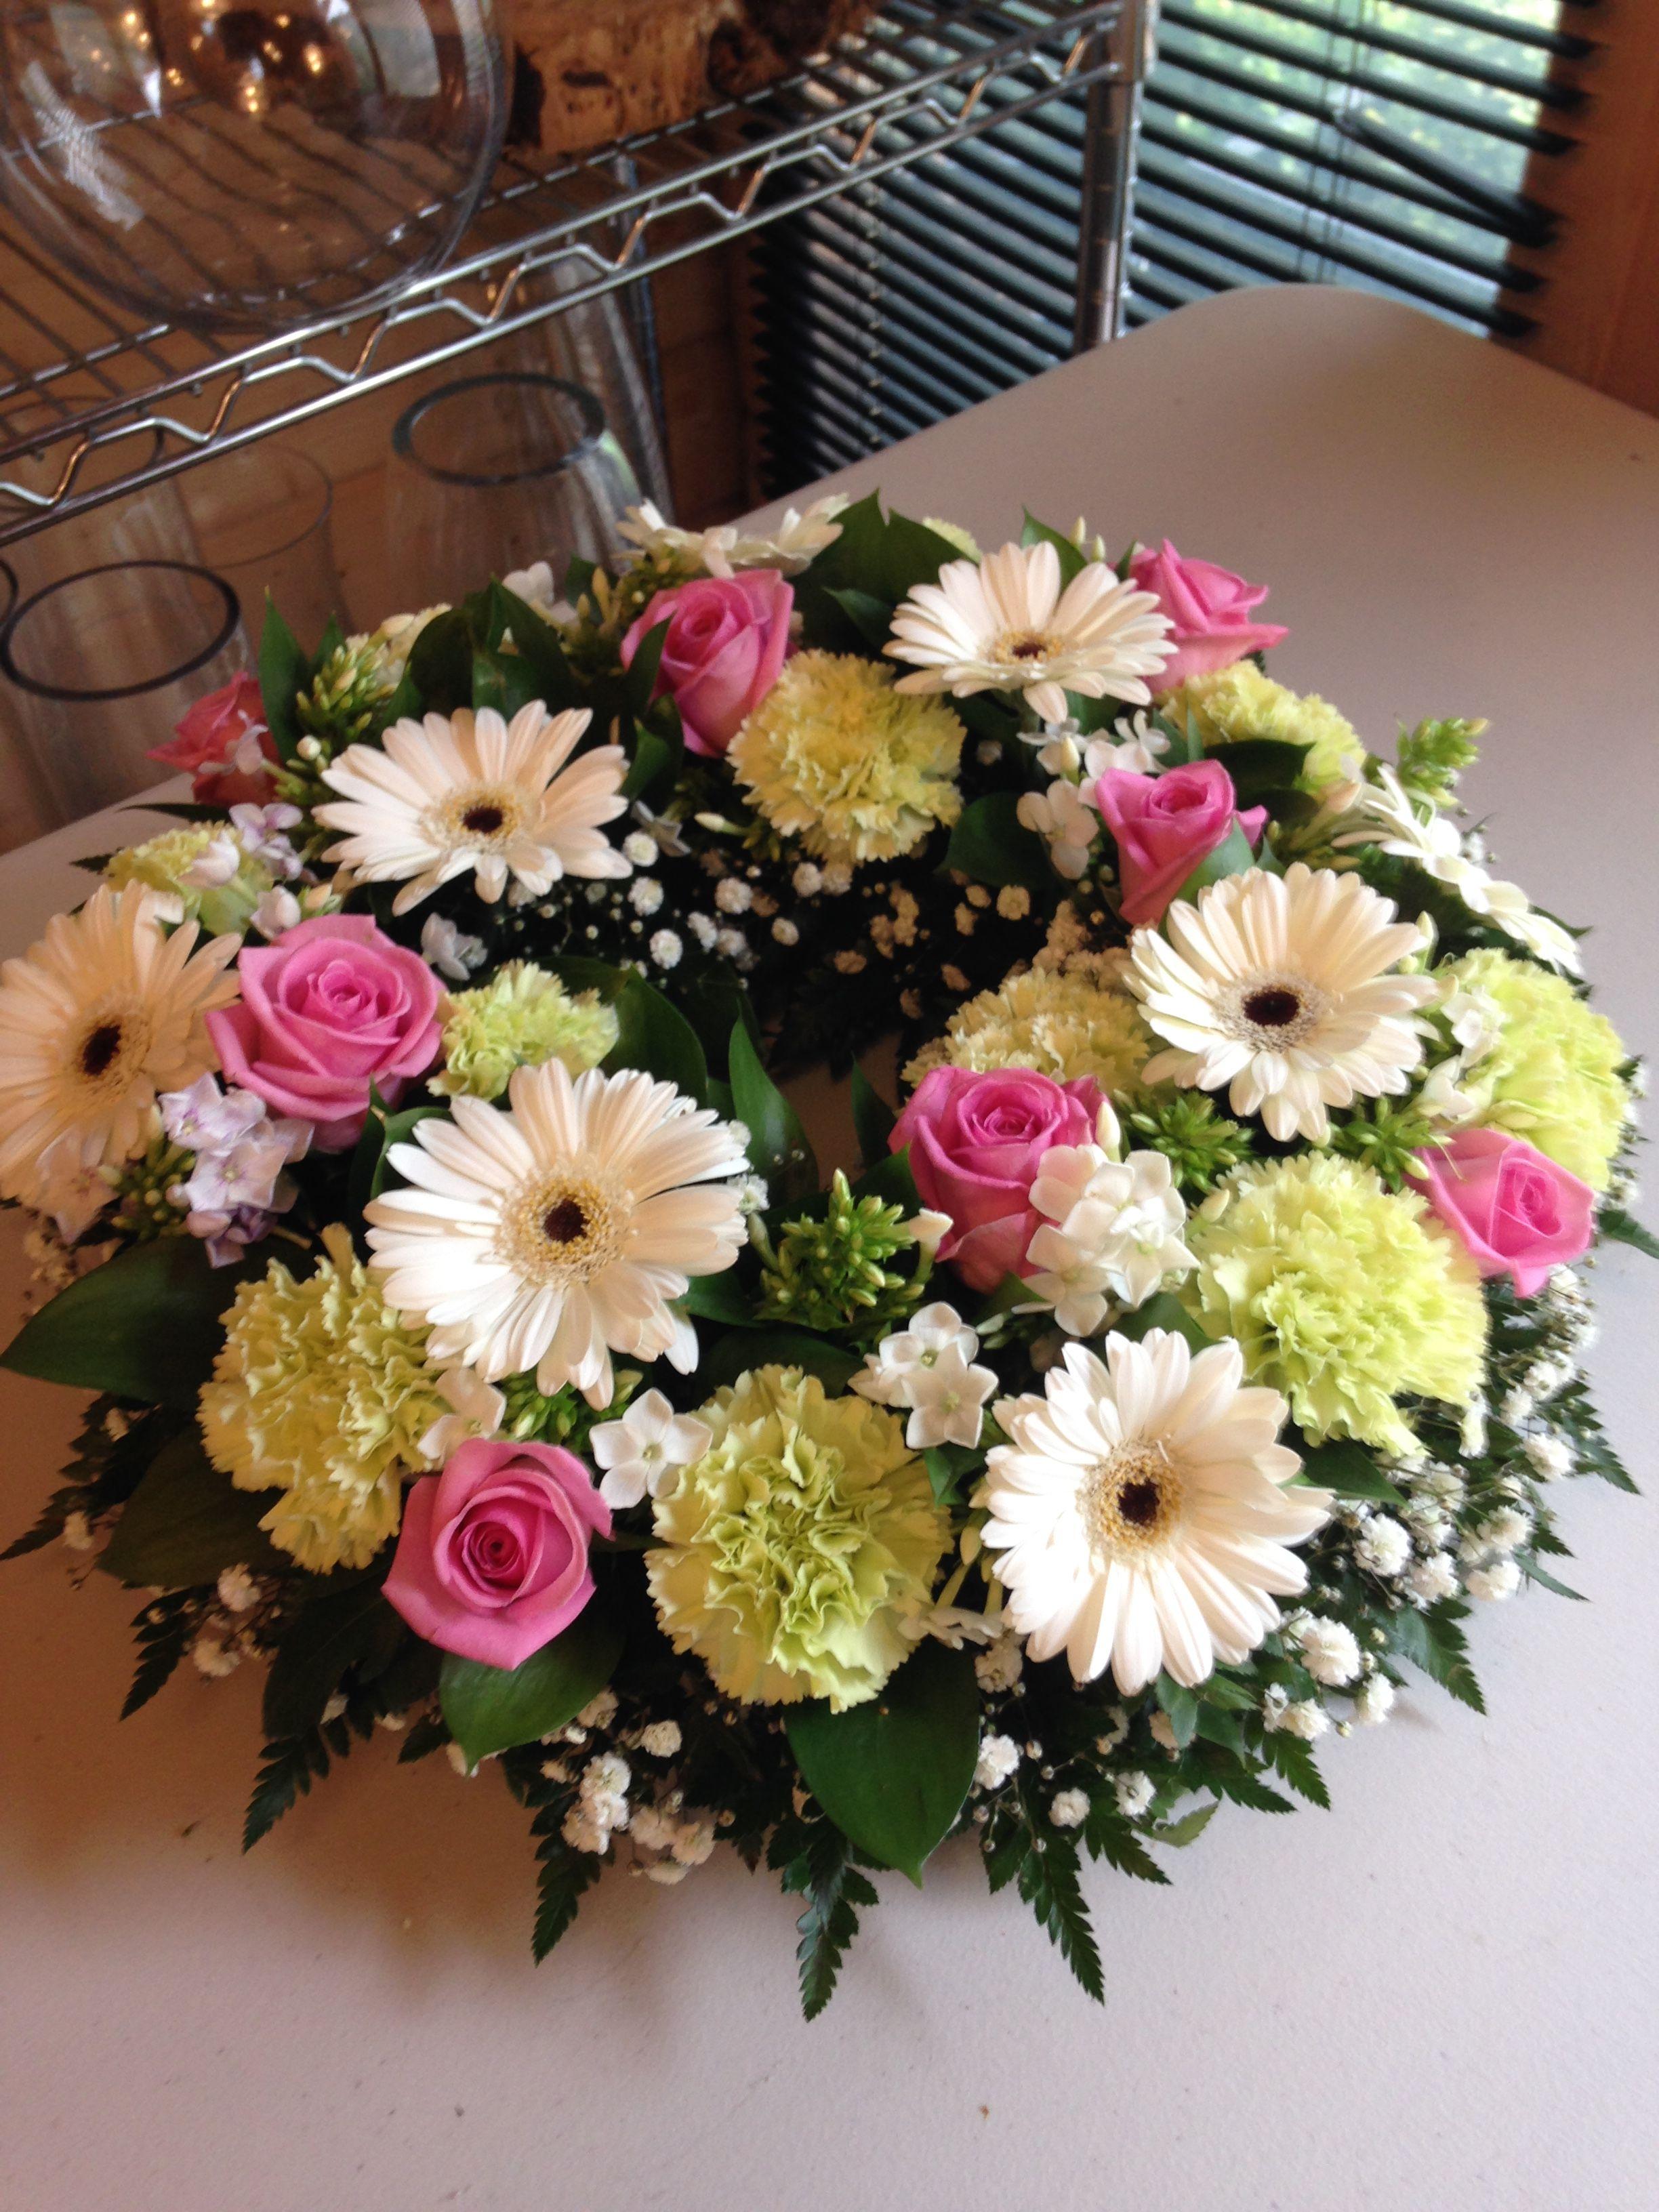 Pin by debra shearer on furneral plansflowers pinterest funeral funeral flowers floral arrangements flower arrangements flower arrangement floral wreath izmirmasajfo